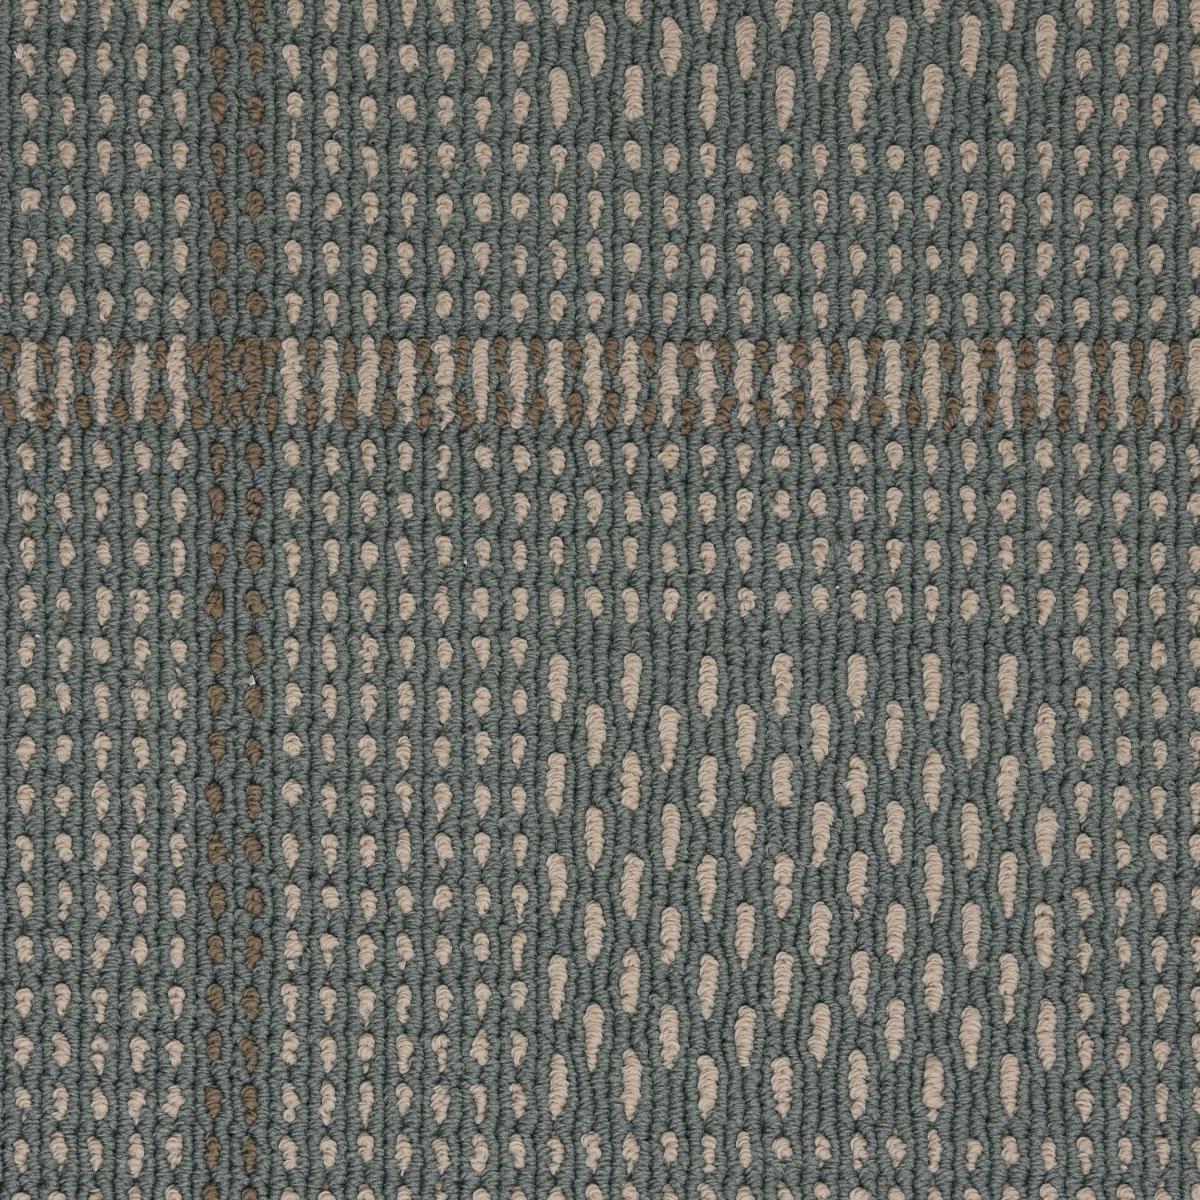 baleni-vibration_nylon_broadloom_patterson-flynn-martin_pfm